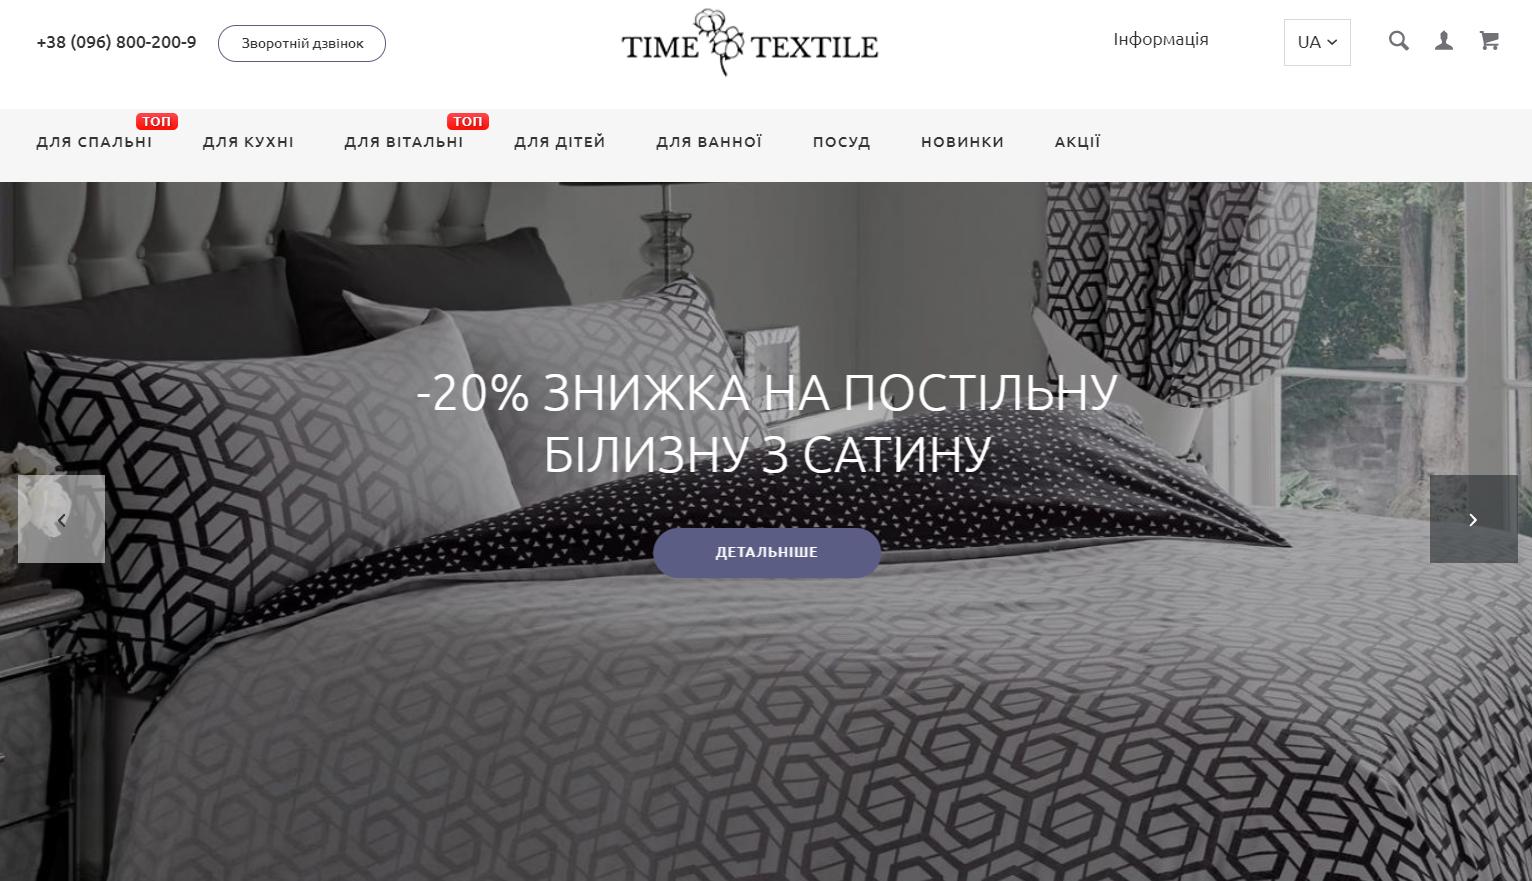 Интернет-магазин Time Textile